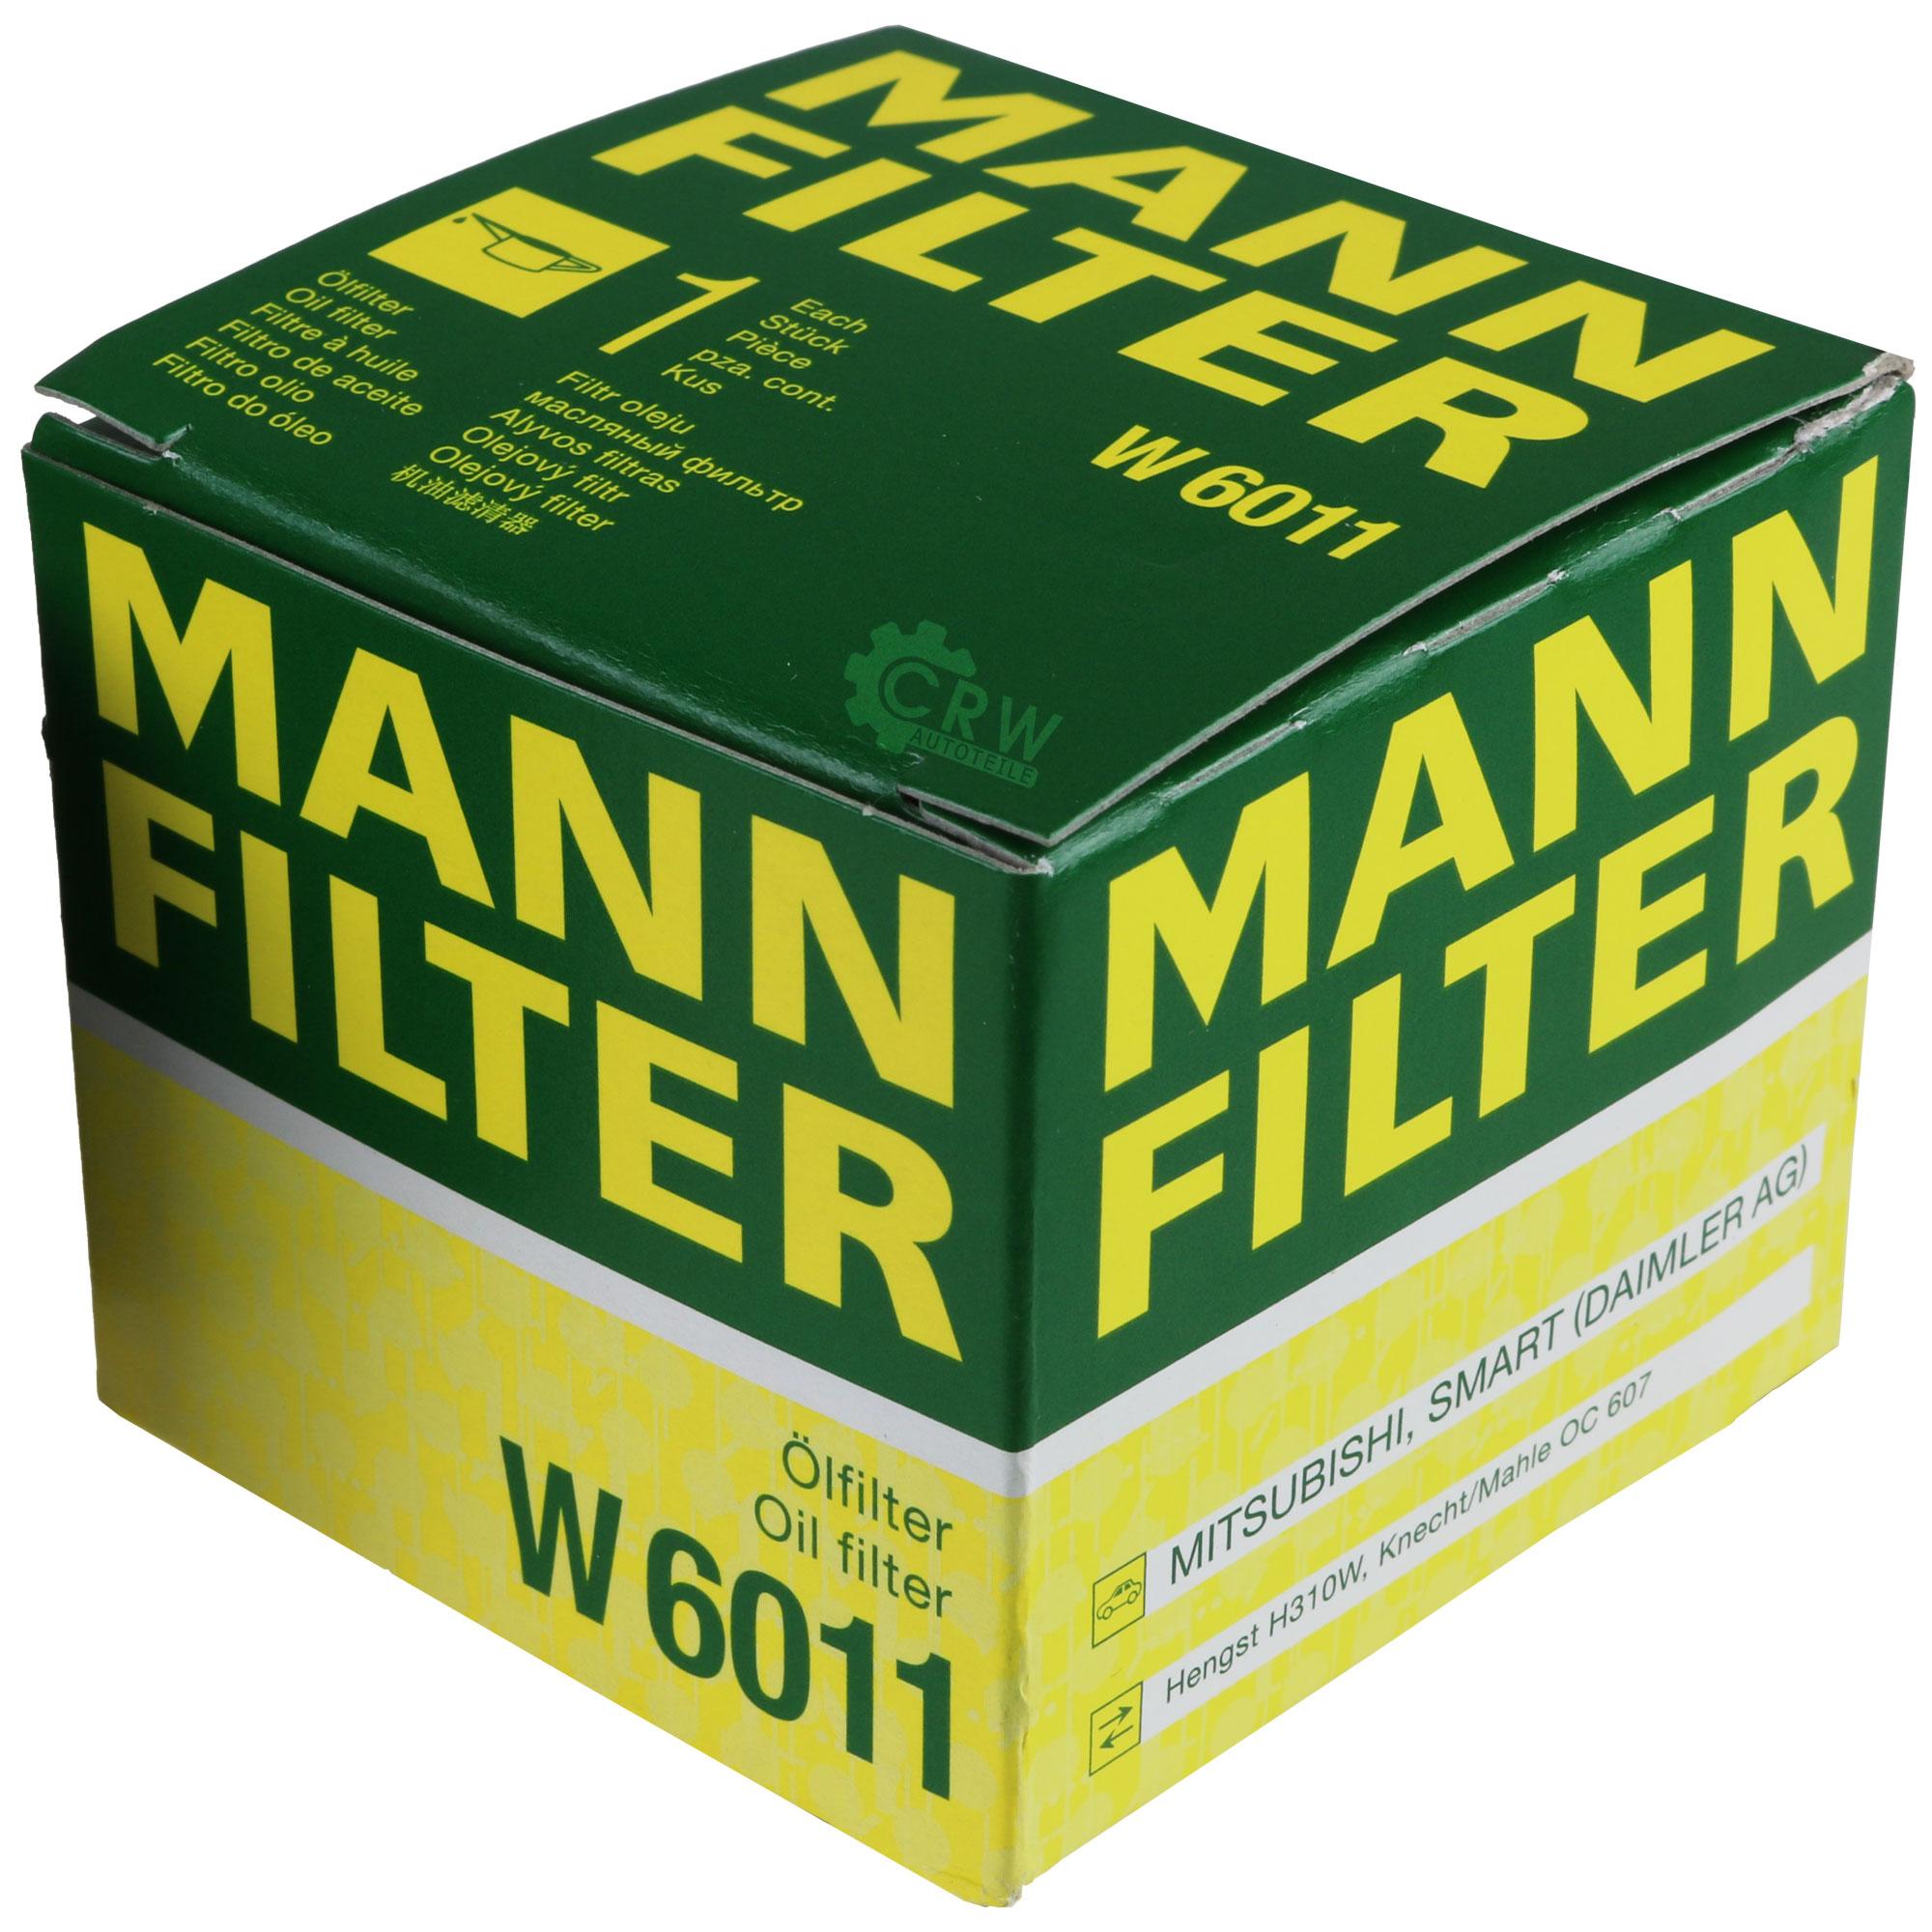 5L-Inspektionspaket-Mercedes-229-51-Motoroel-5W-30-MANN-Olfilter-11124948 Indexbild 5